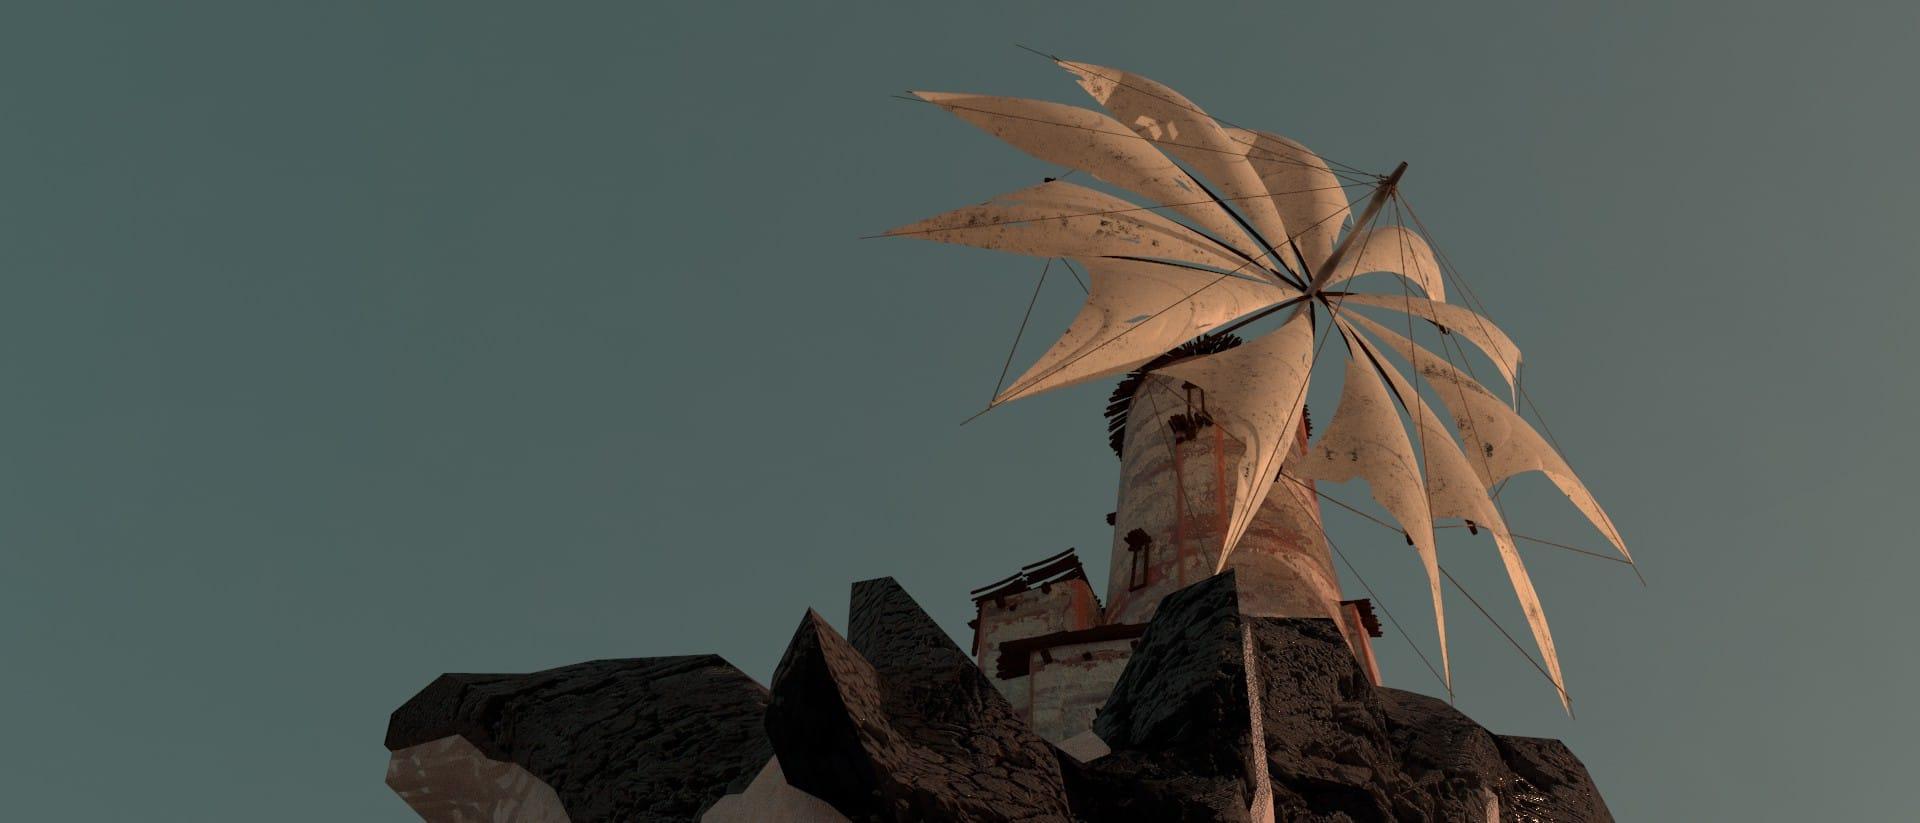 Image of concept, tower& windmill by Jakub Kowalczyk, Senior Concept Artist & Illustrator at 11 bit studios done in Keyshot